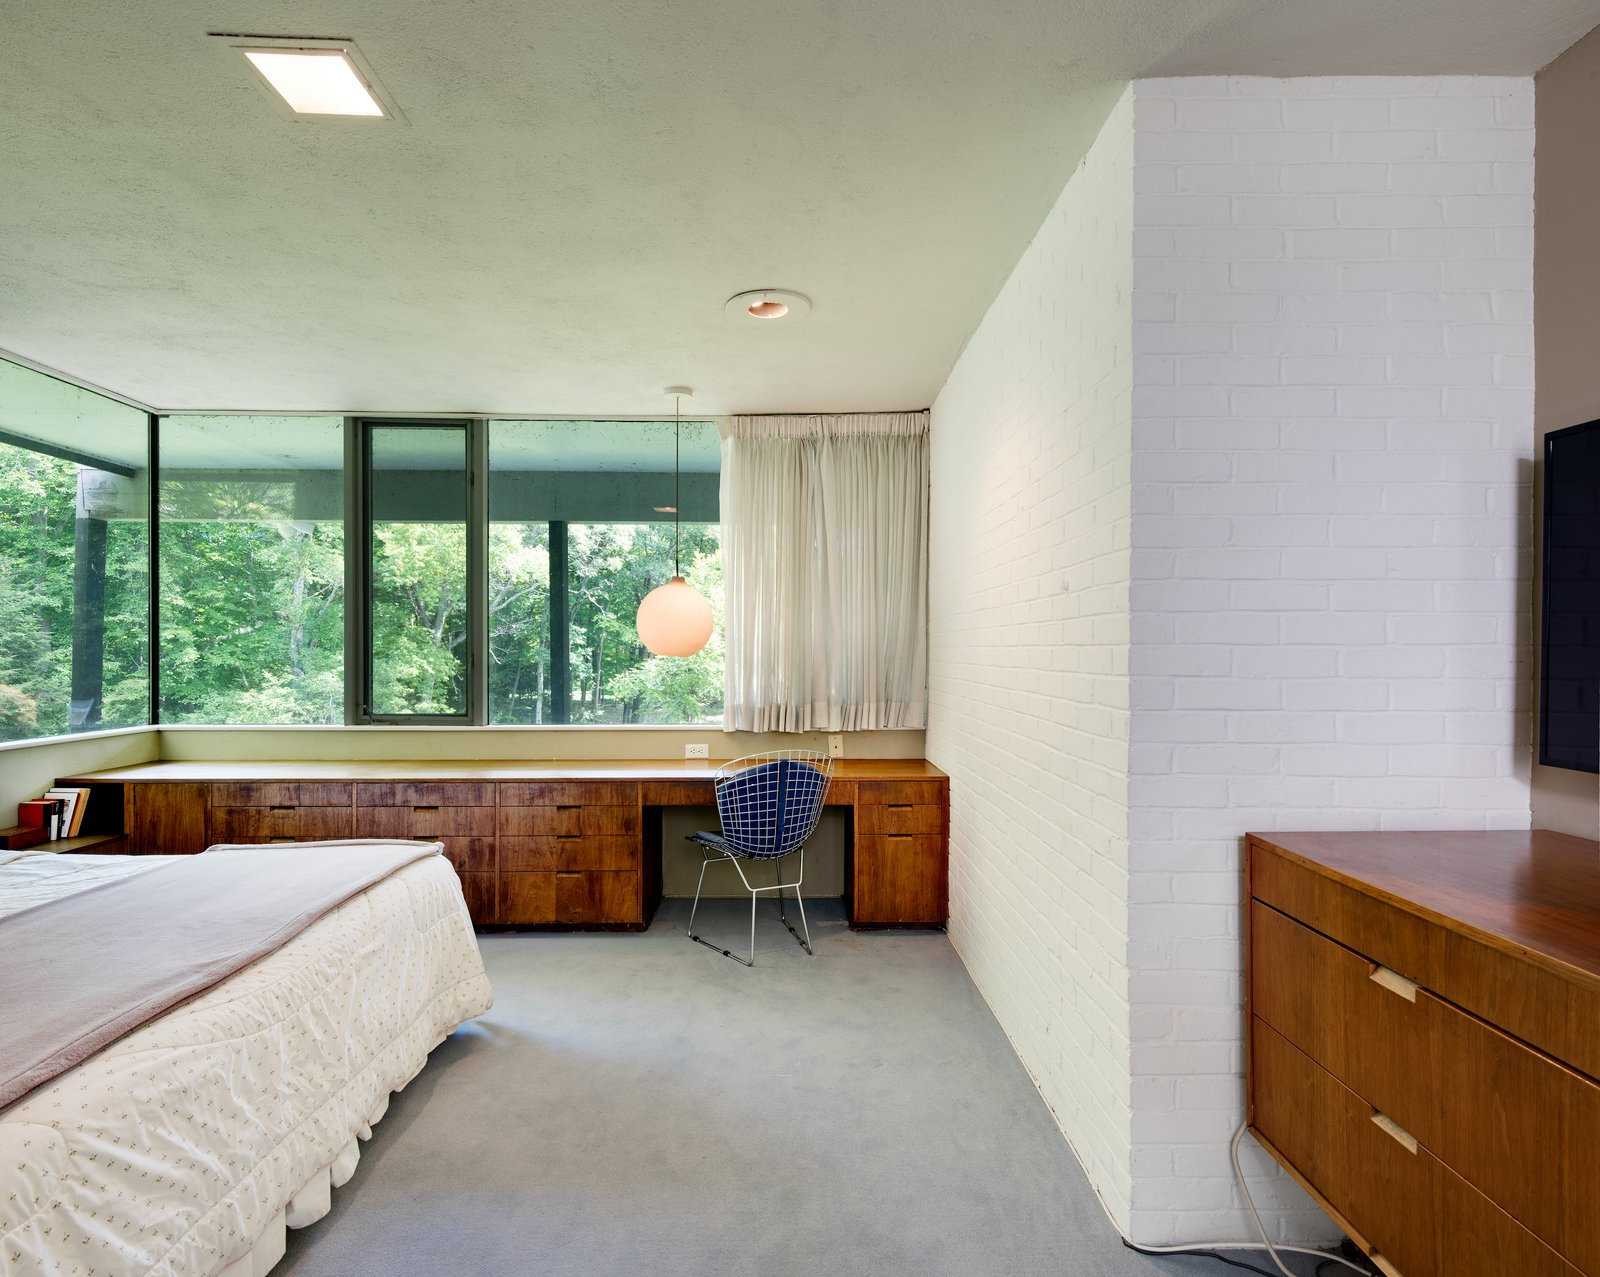 The Corwin House bedroom